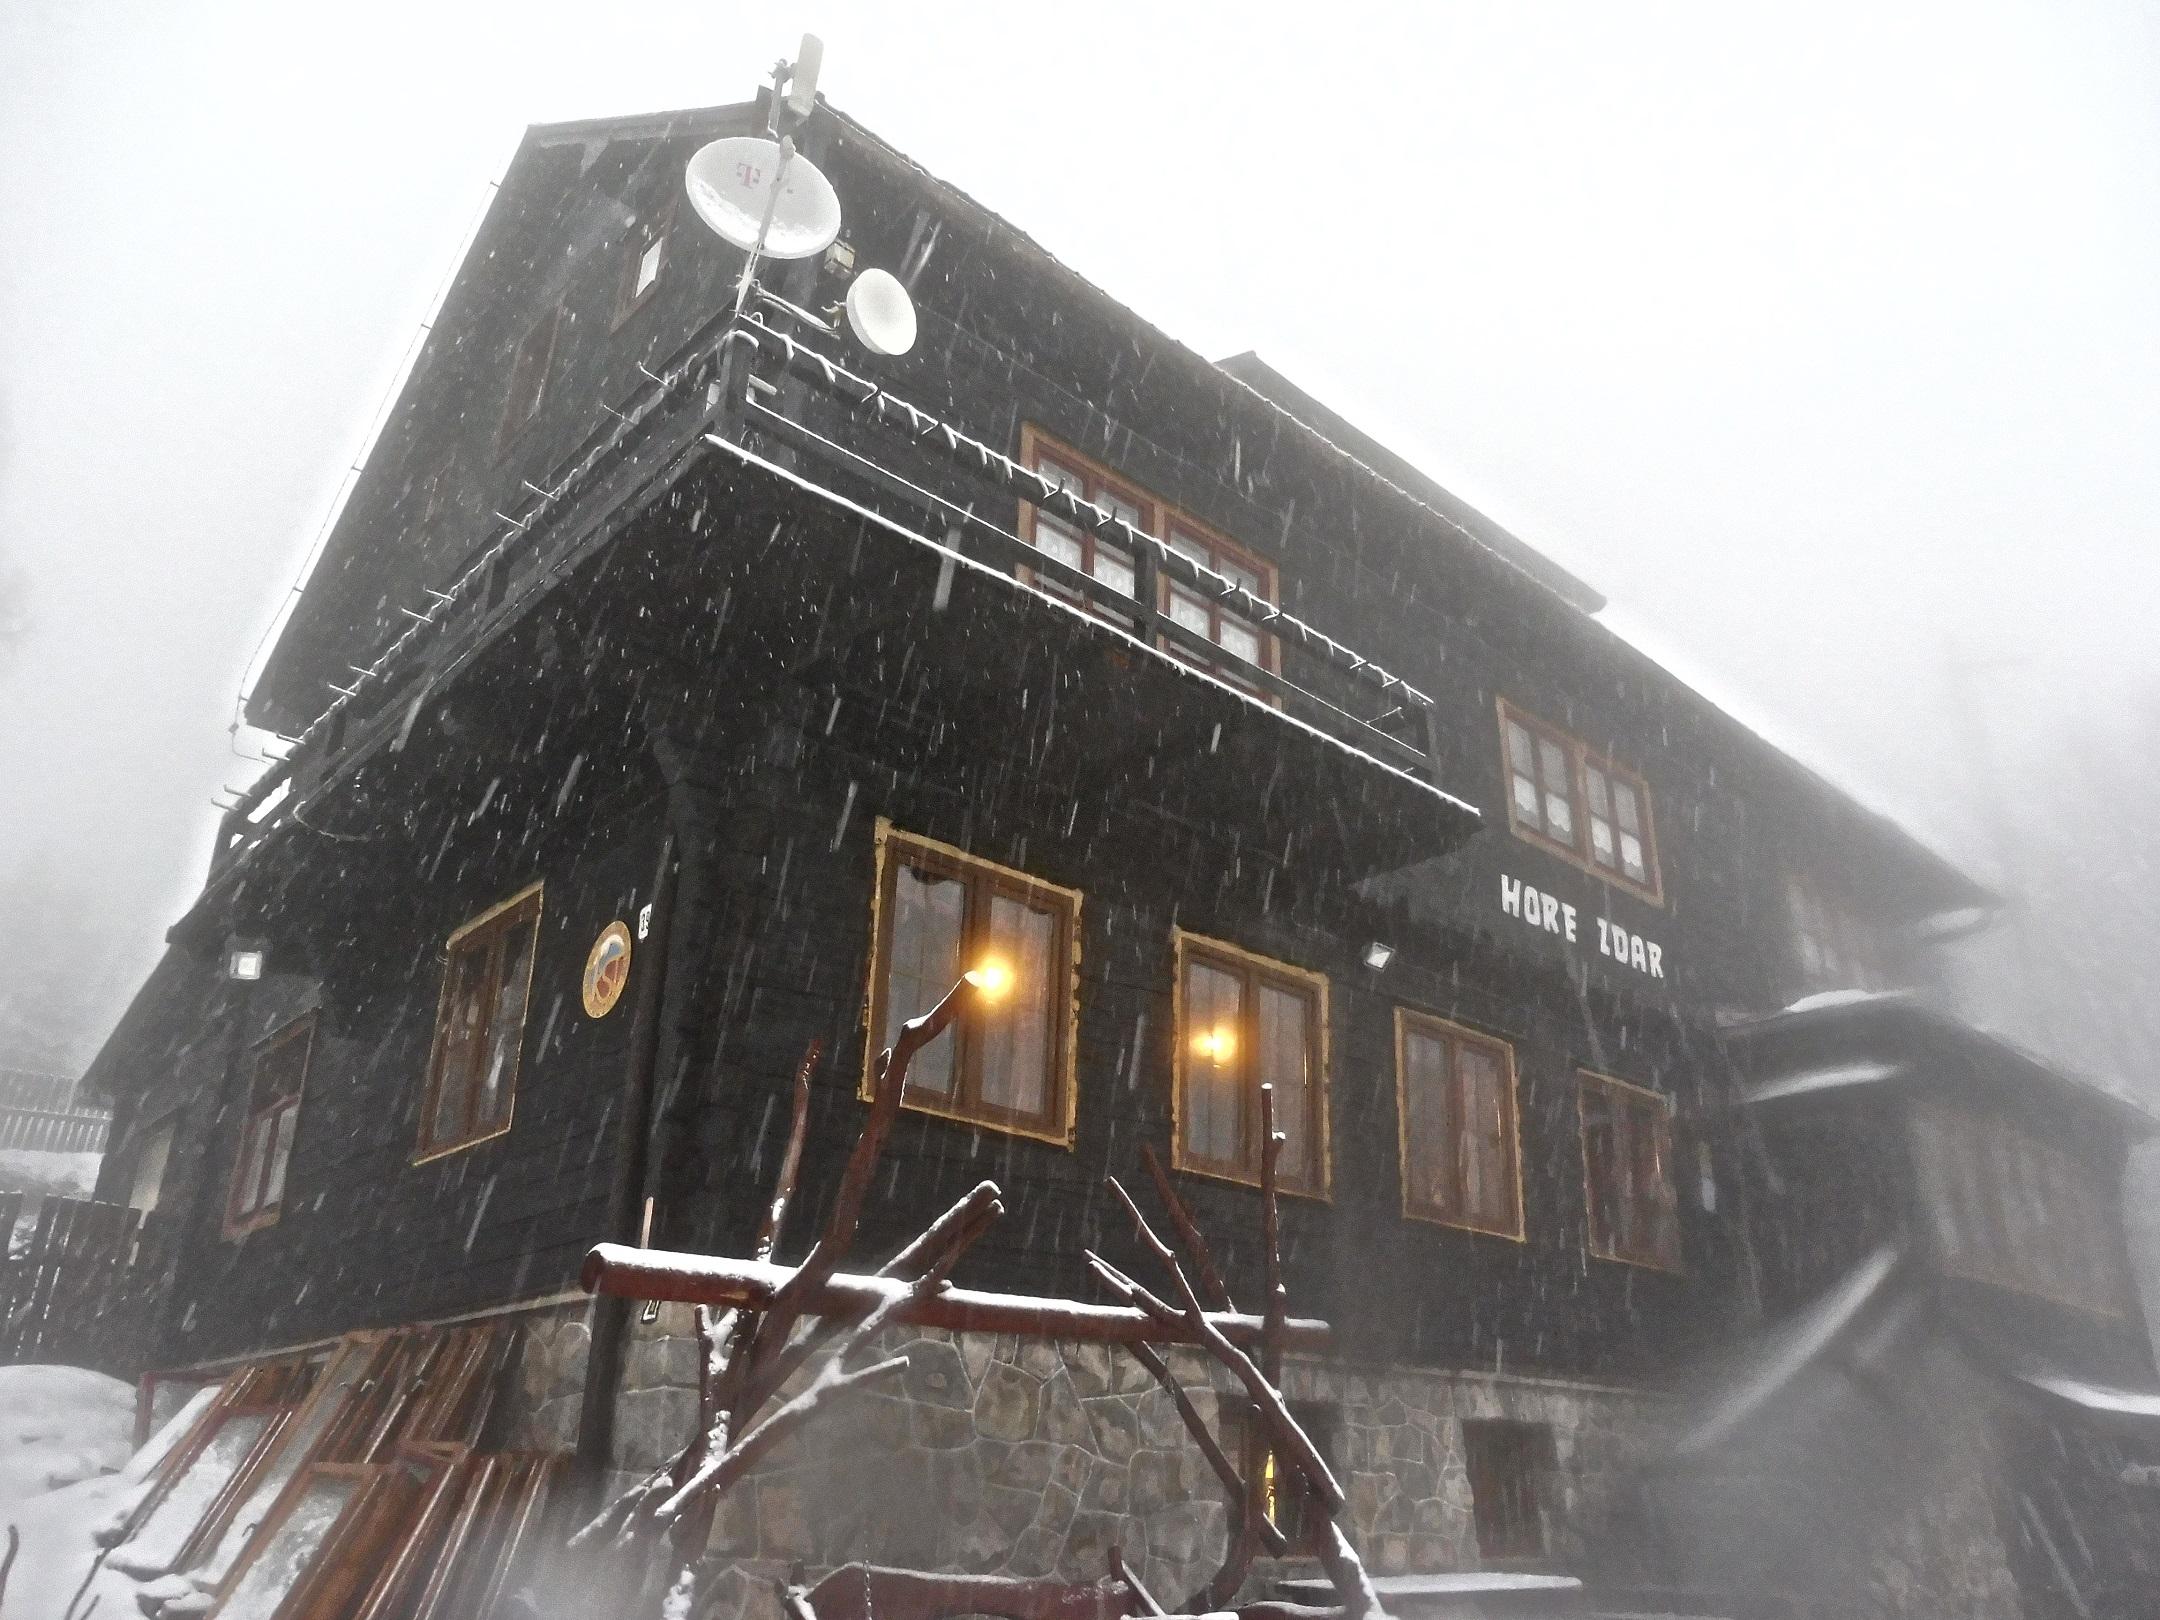 Chata pod Klacianskou Magurou turistaház